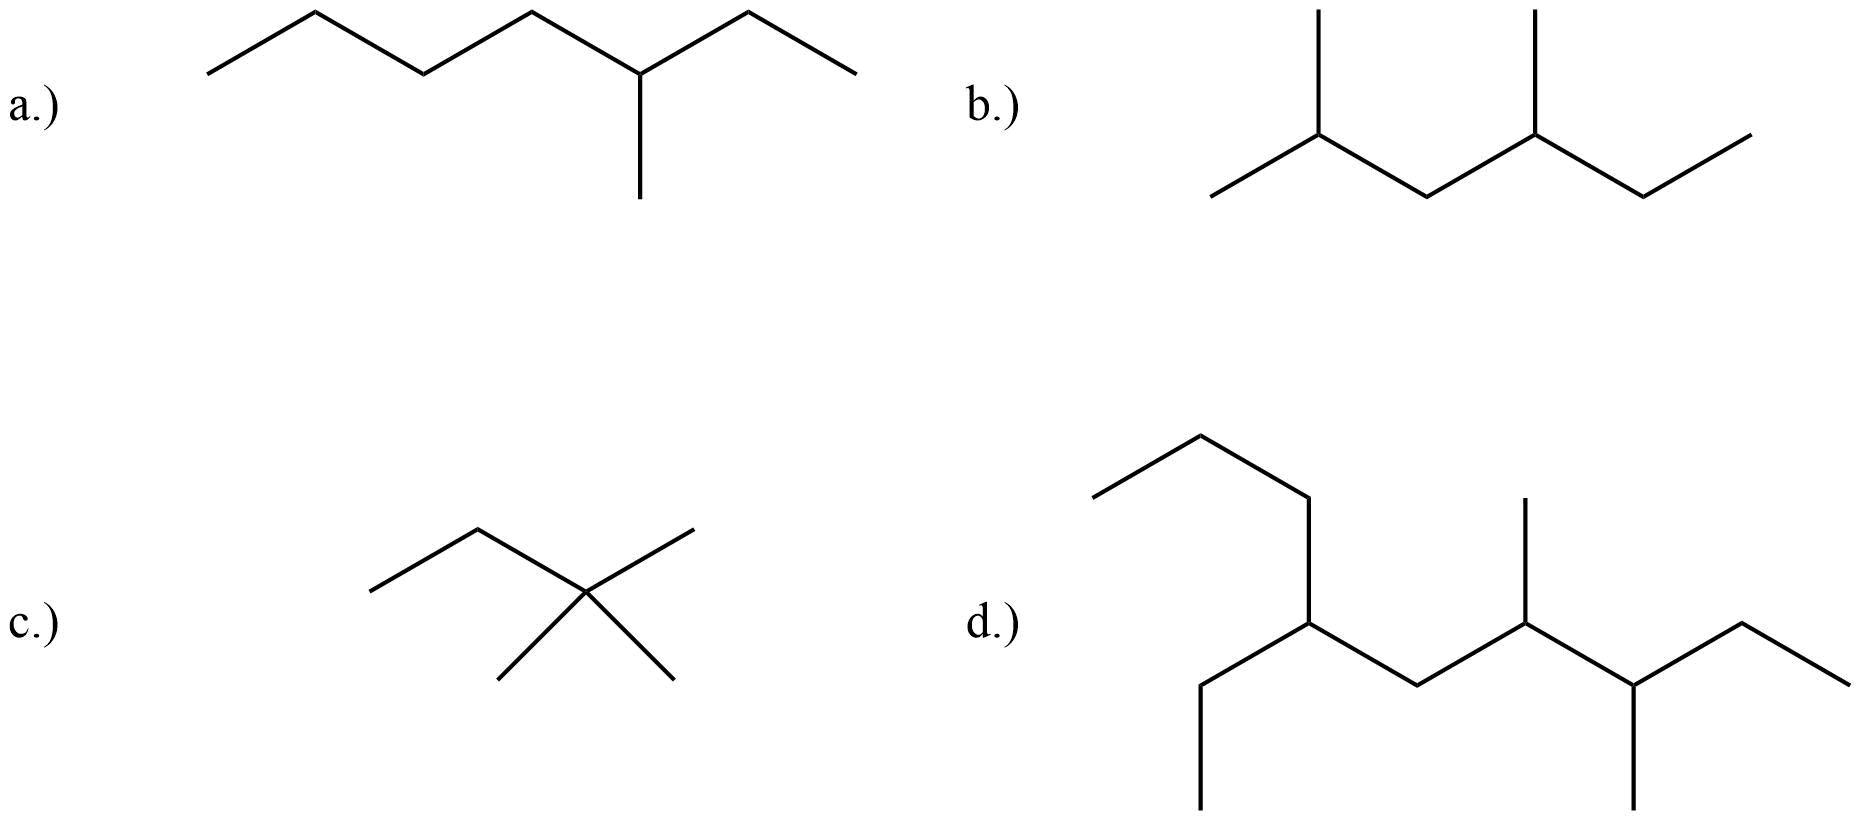 bung-zur-Nomenklatur-der-Alkane Nomenklatur der Alkane